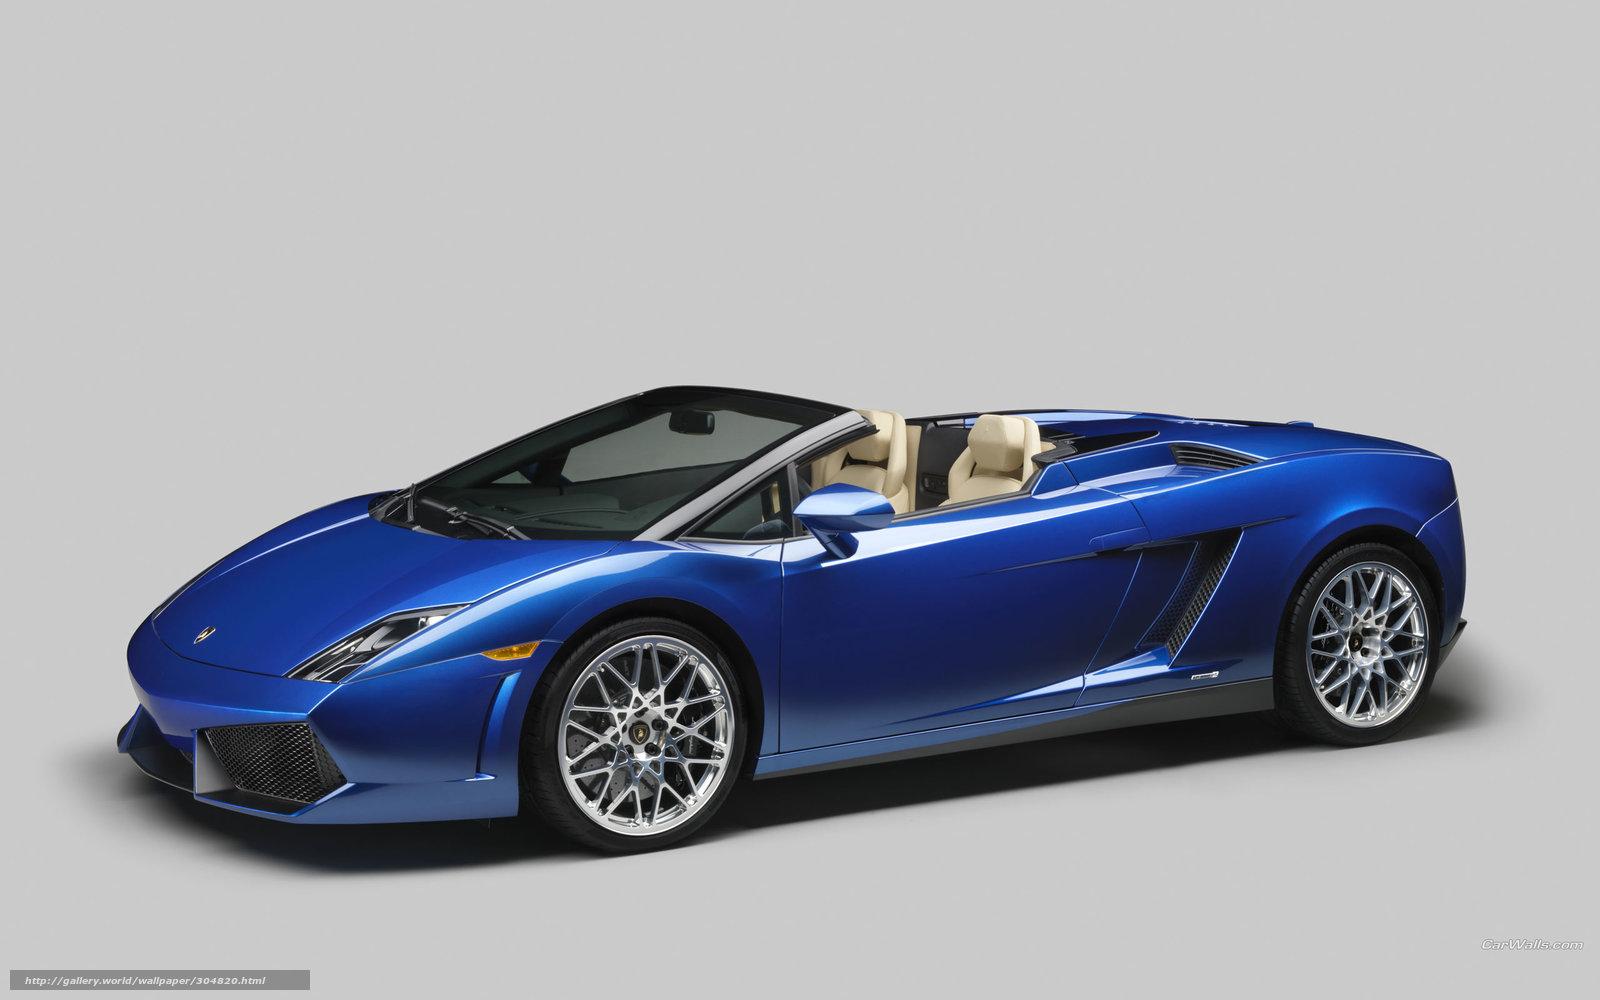 Download Wallpaper Lamborghini Countach Car Machinery Free Desktop Wallpaper In The